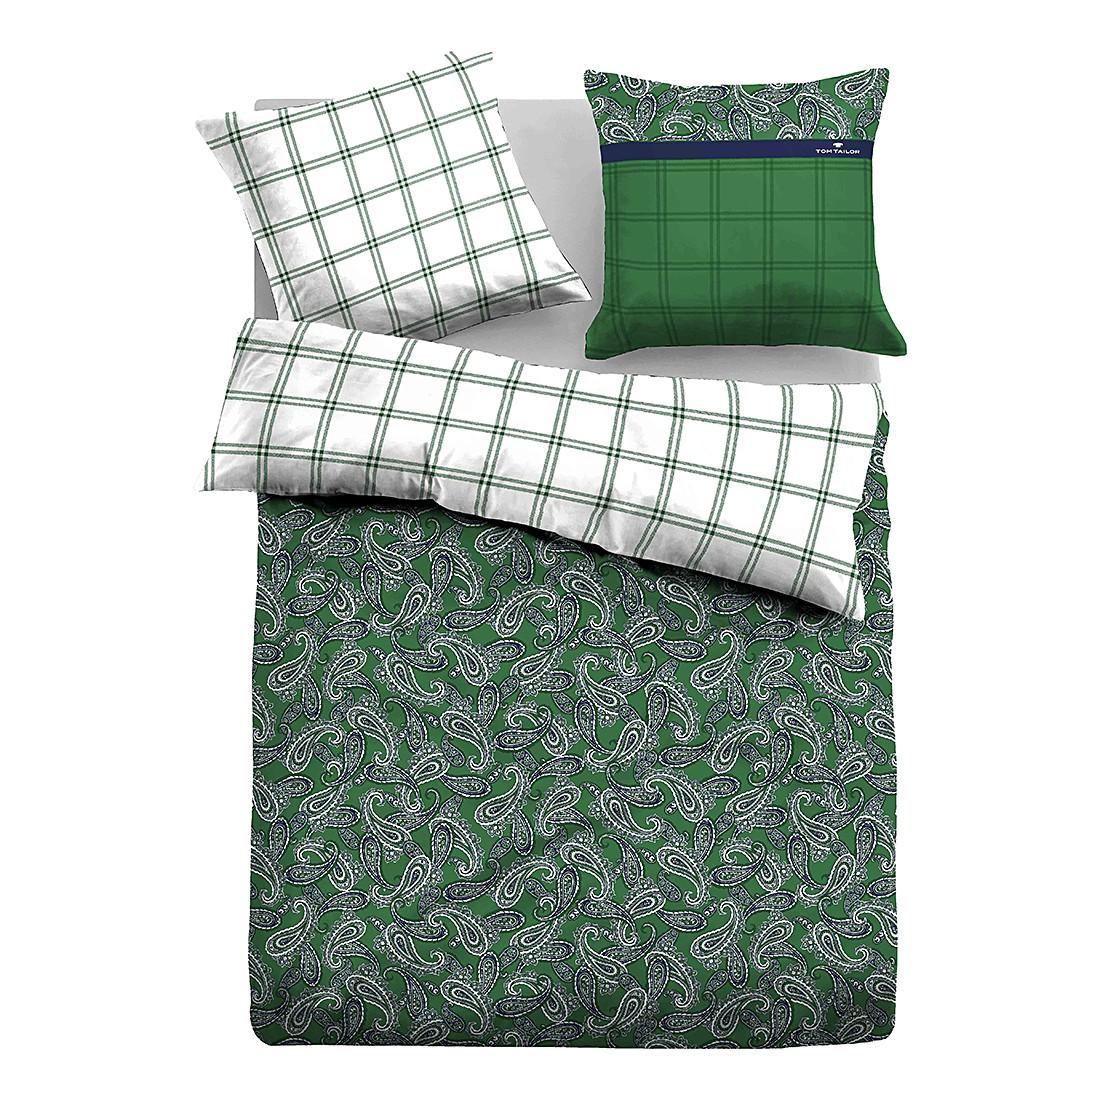 Satin Bettwäsche Paisley - Grün - 135 x 200 cm + Kissen 80 x 80 cm, Tom Tailor